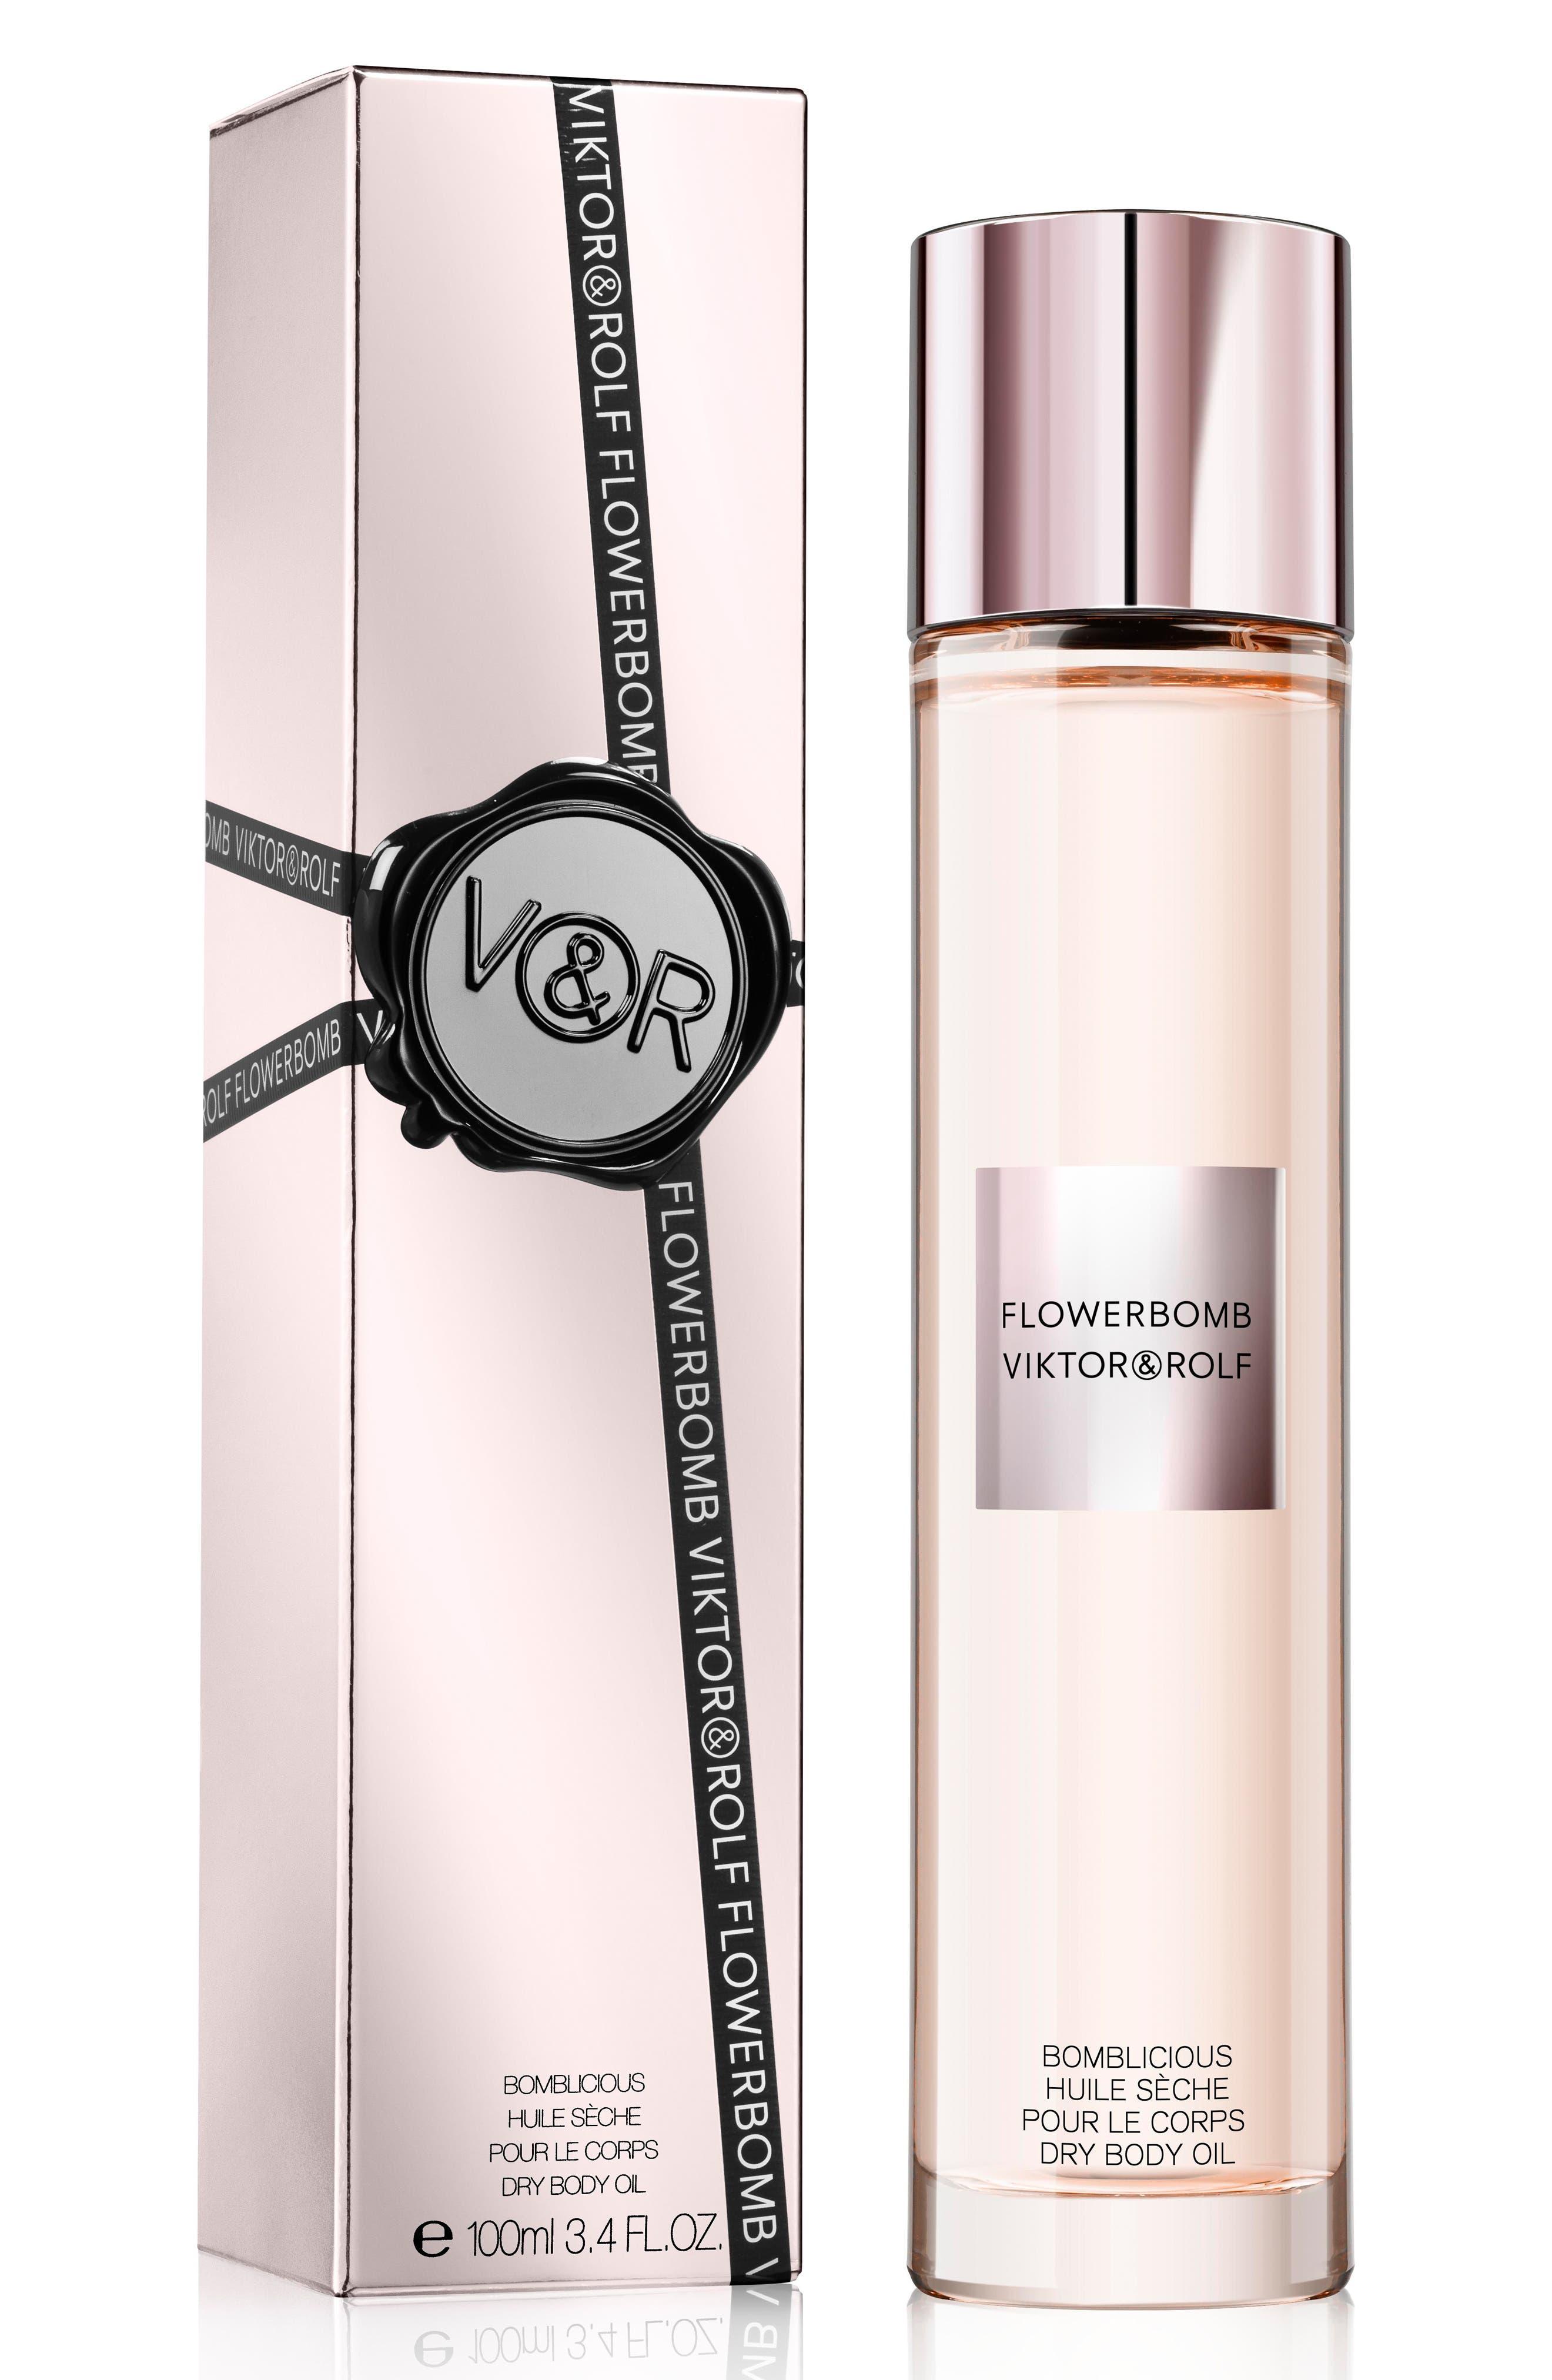 Viktorrolf Flowerbomb Perfume Nordstrom